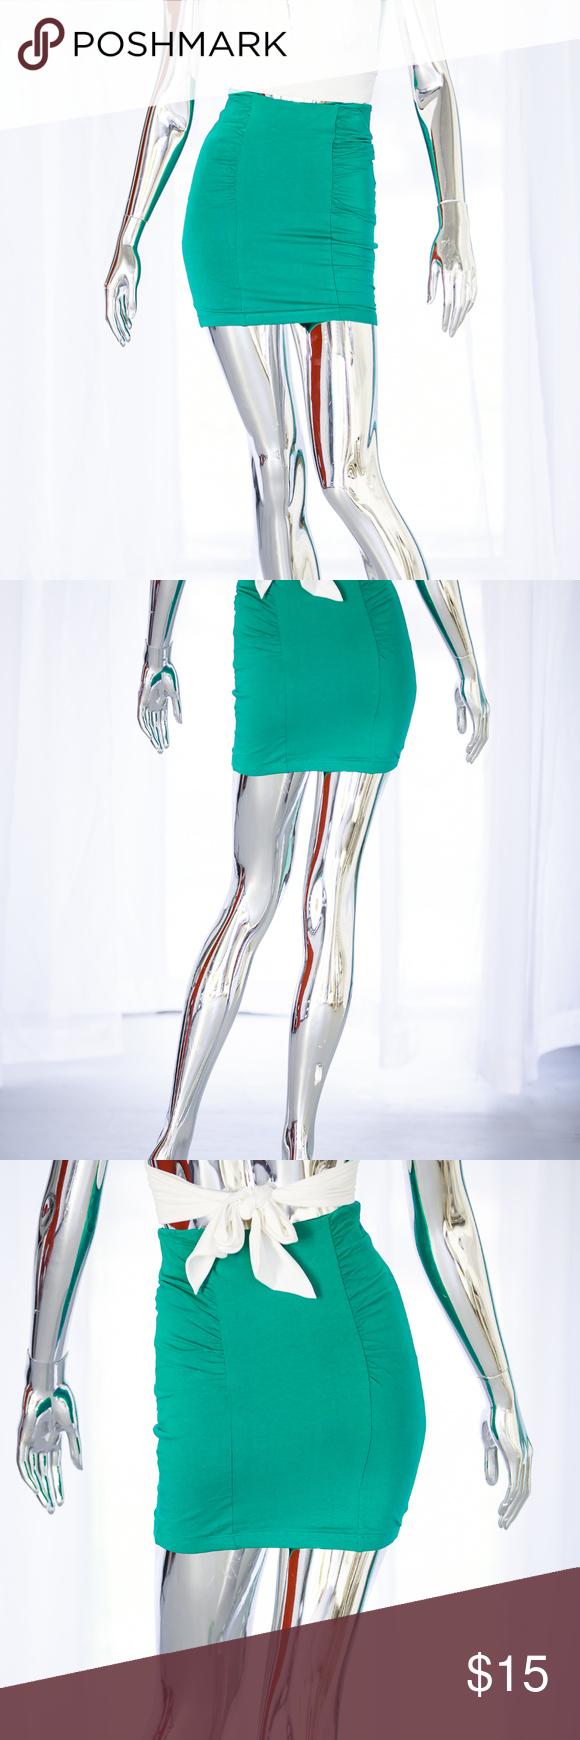 NWT kelly green ruched mini skirt kelly green ruched mini skirt Forever 21 Skirts Mini